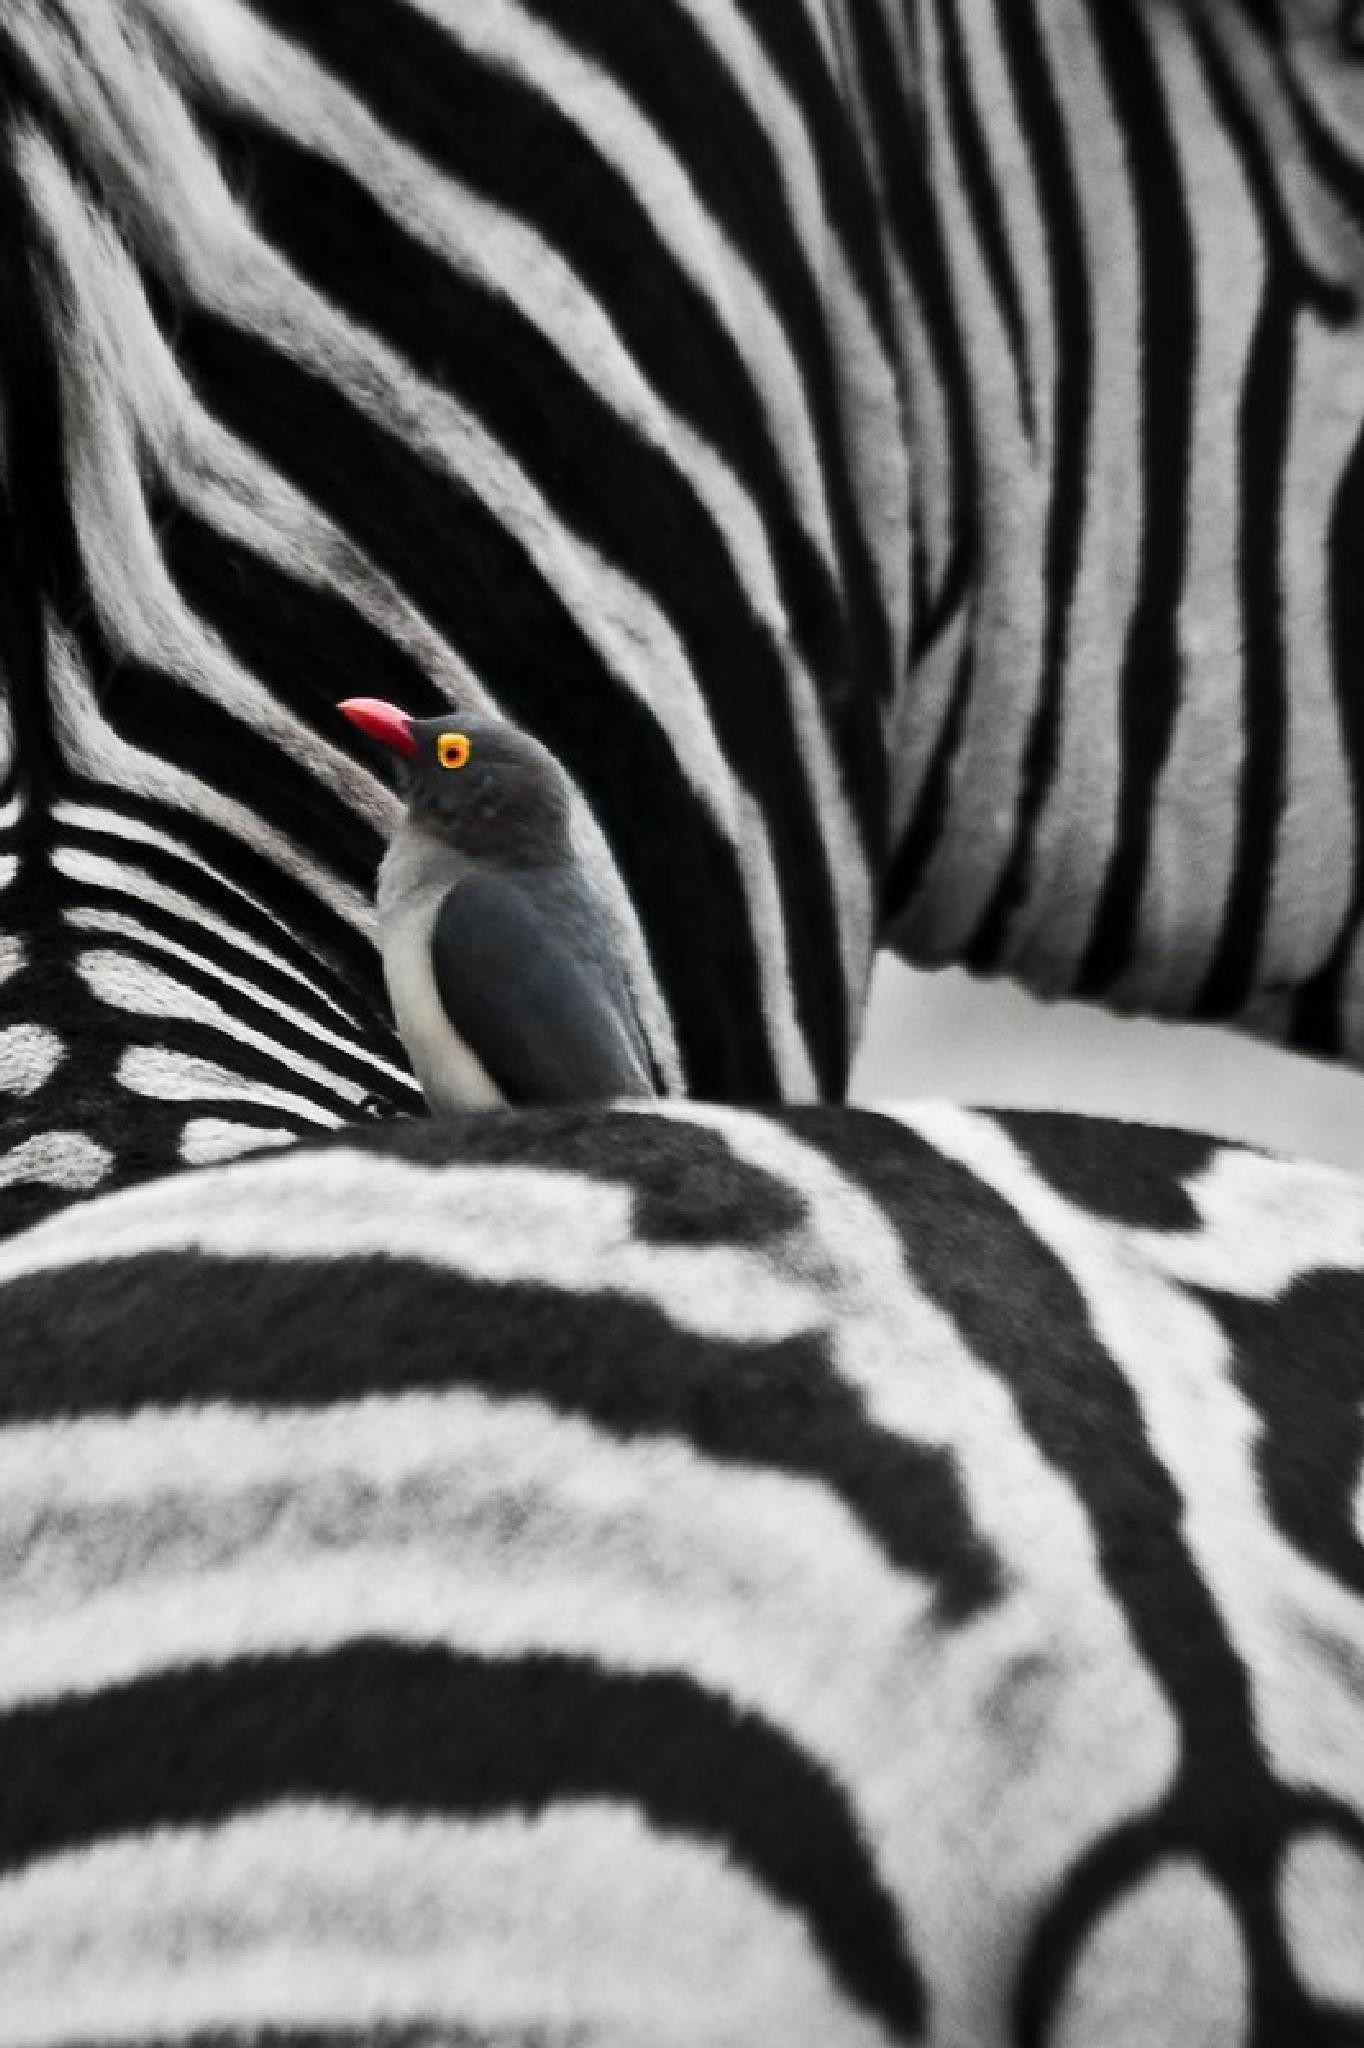 oxpecker by ragnaroek